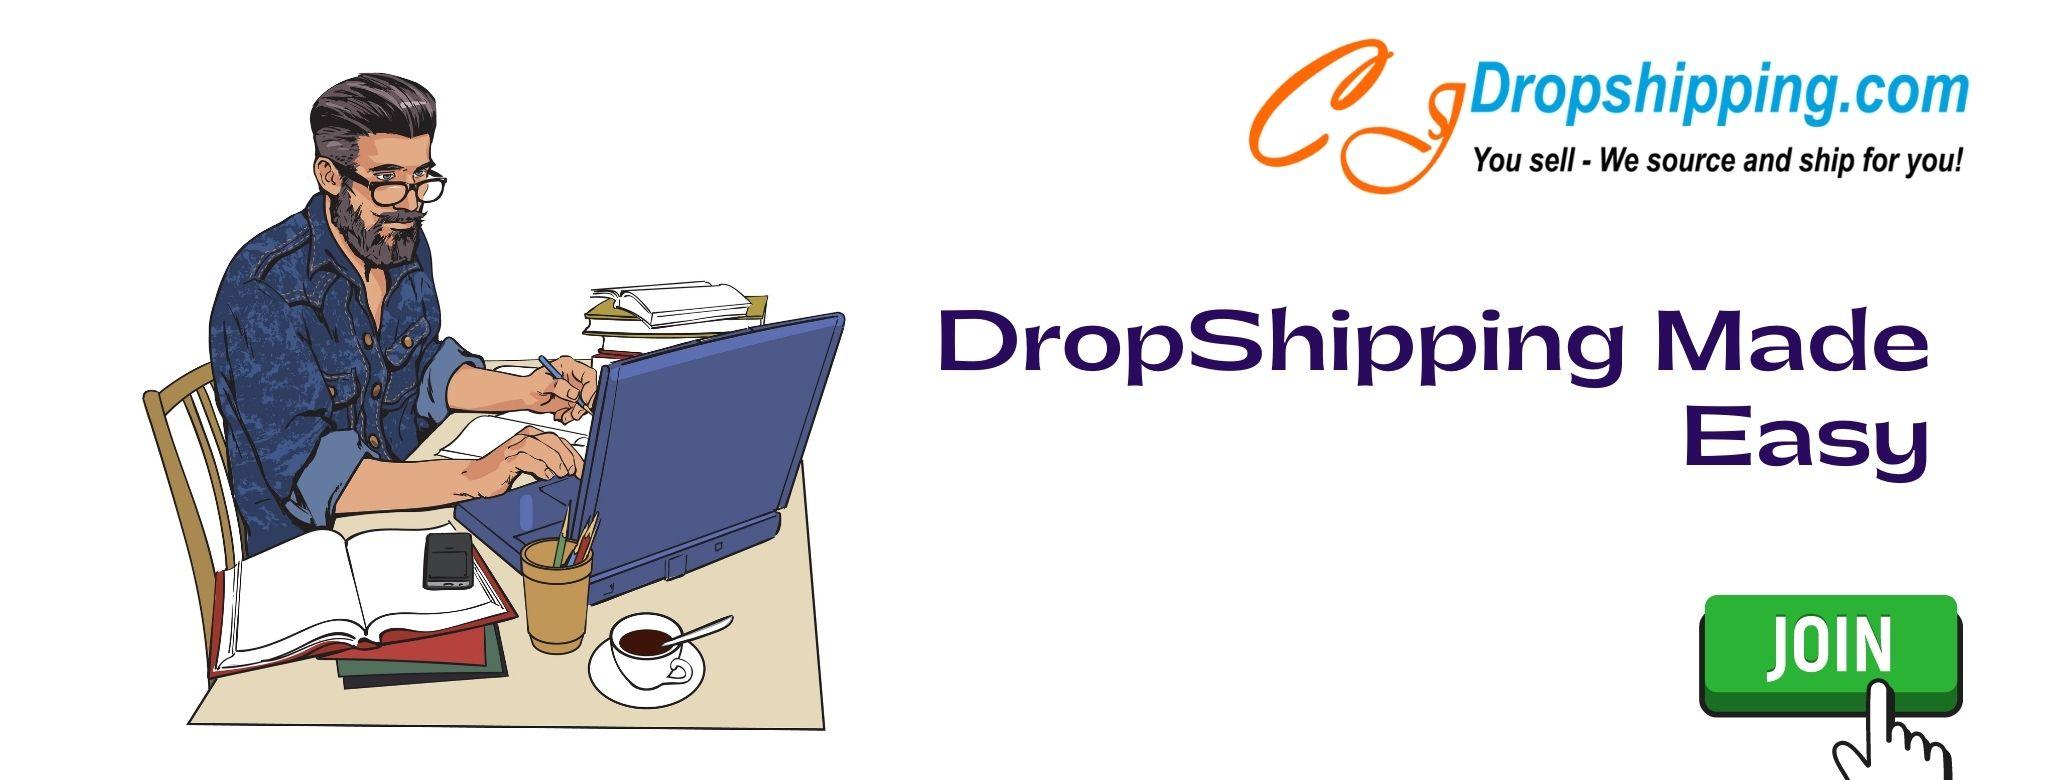 cj dropshipping review